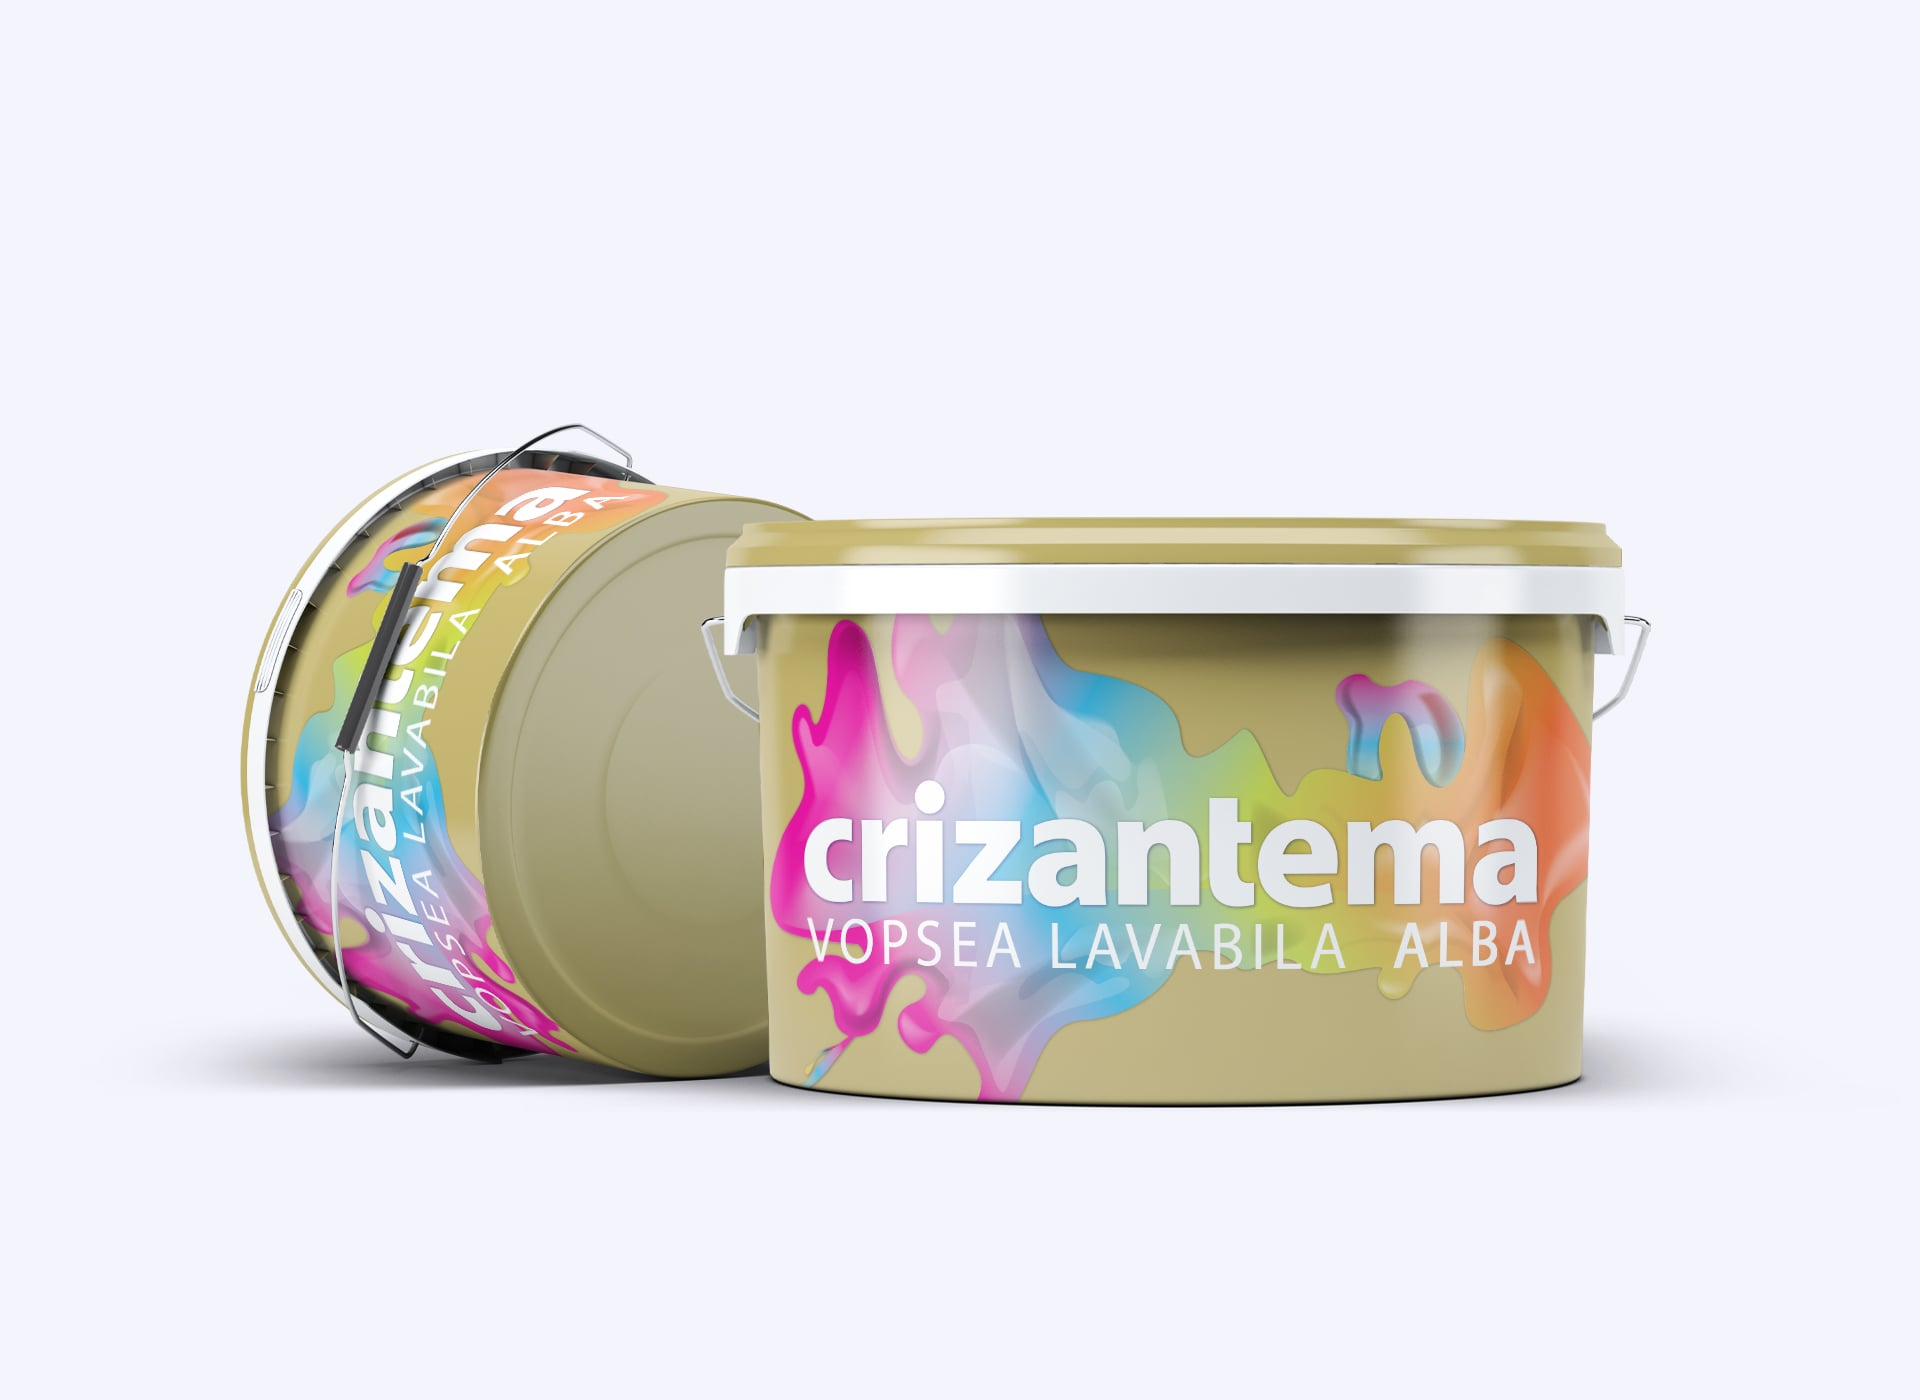 crizantema portofoliu branding produs inoveo